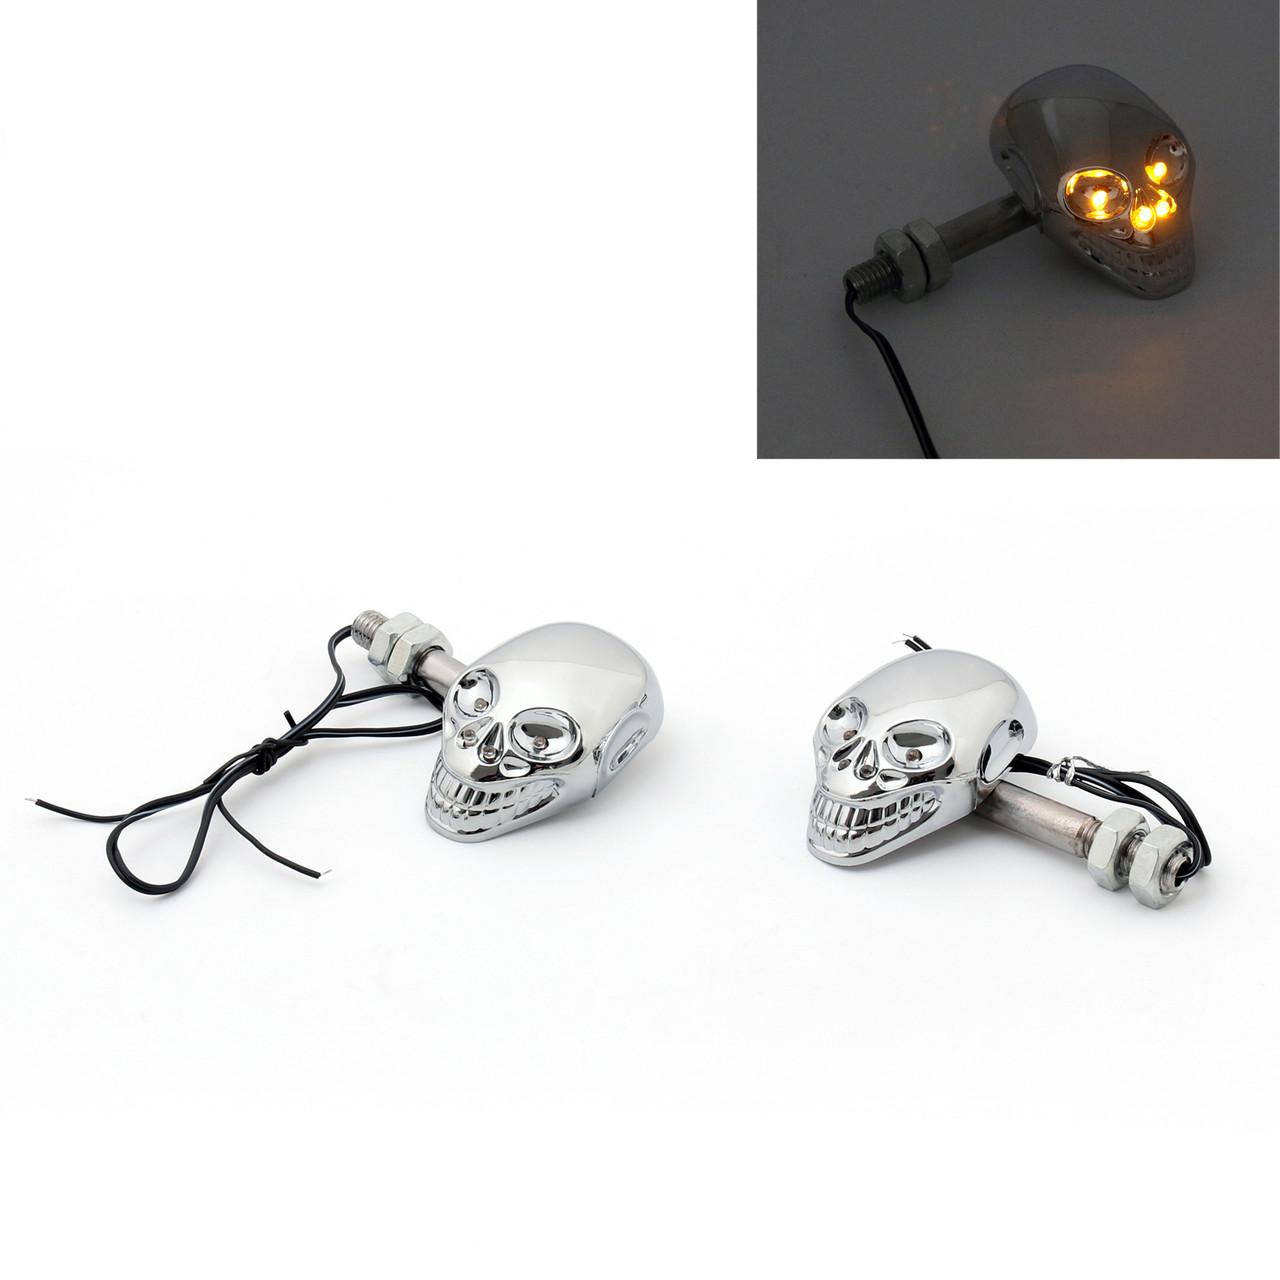 Skull Skeleton Head LED Indicators Turn Signals Universal Fit Custom Chopper, Chrome